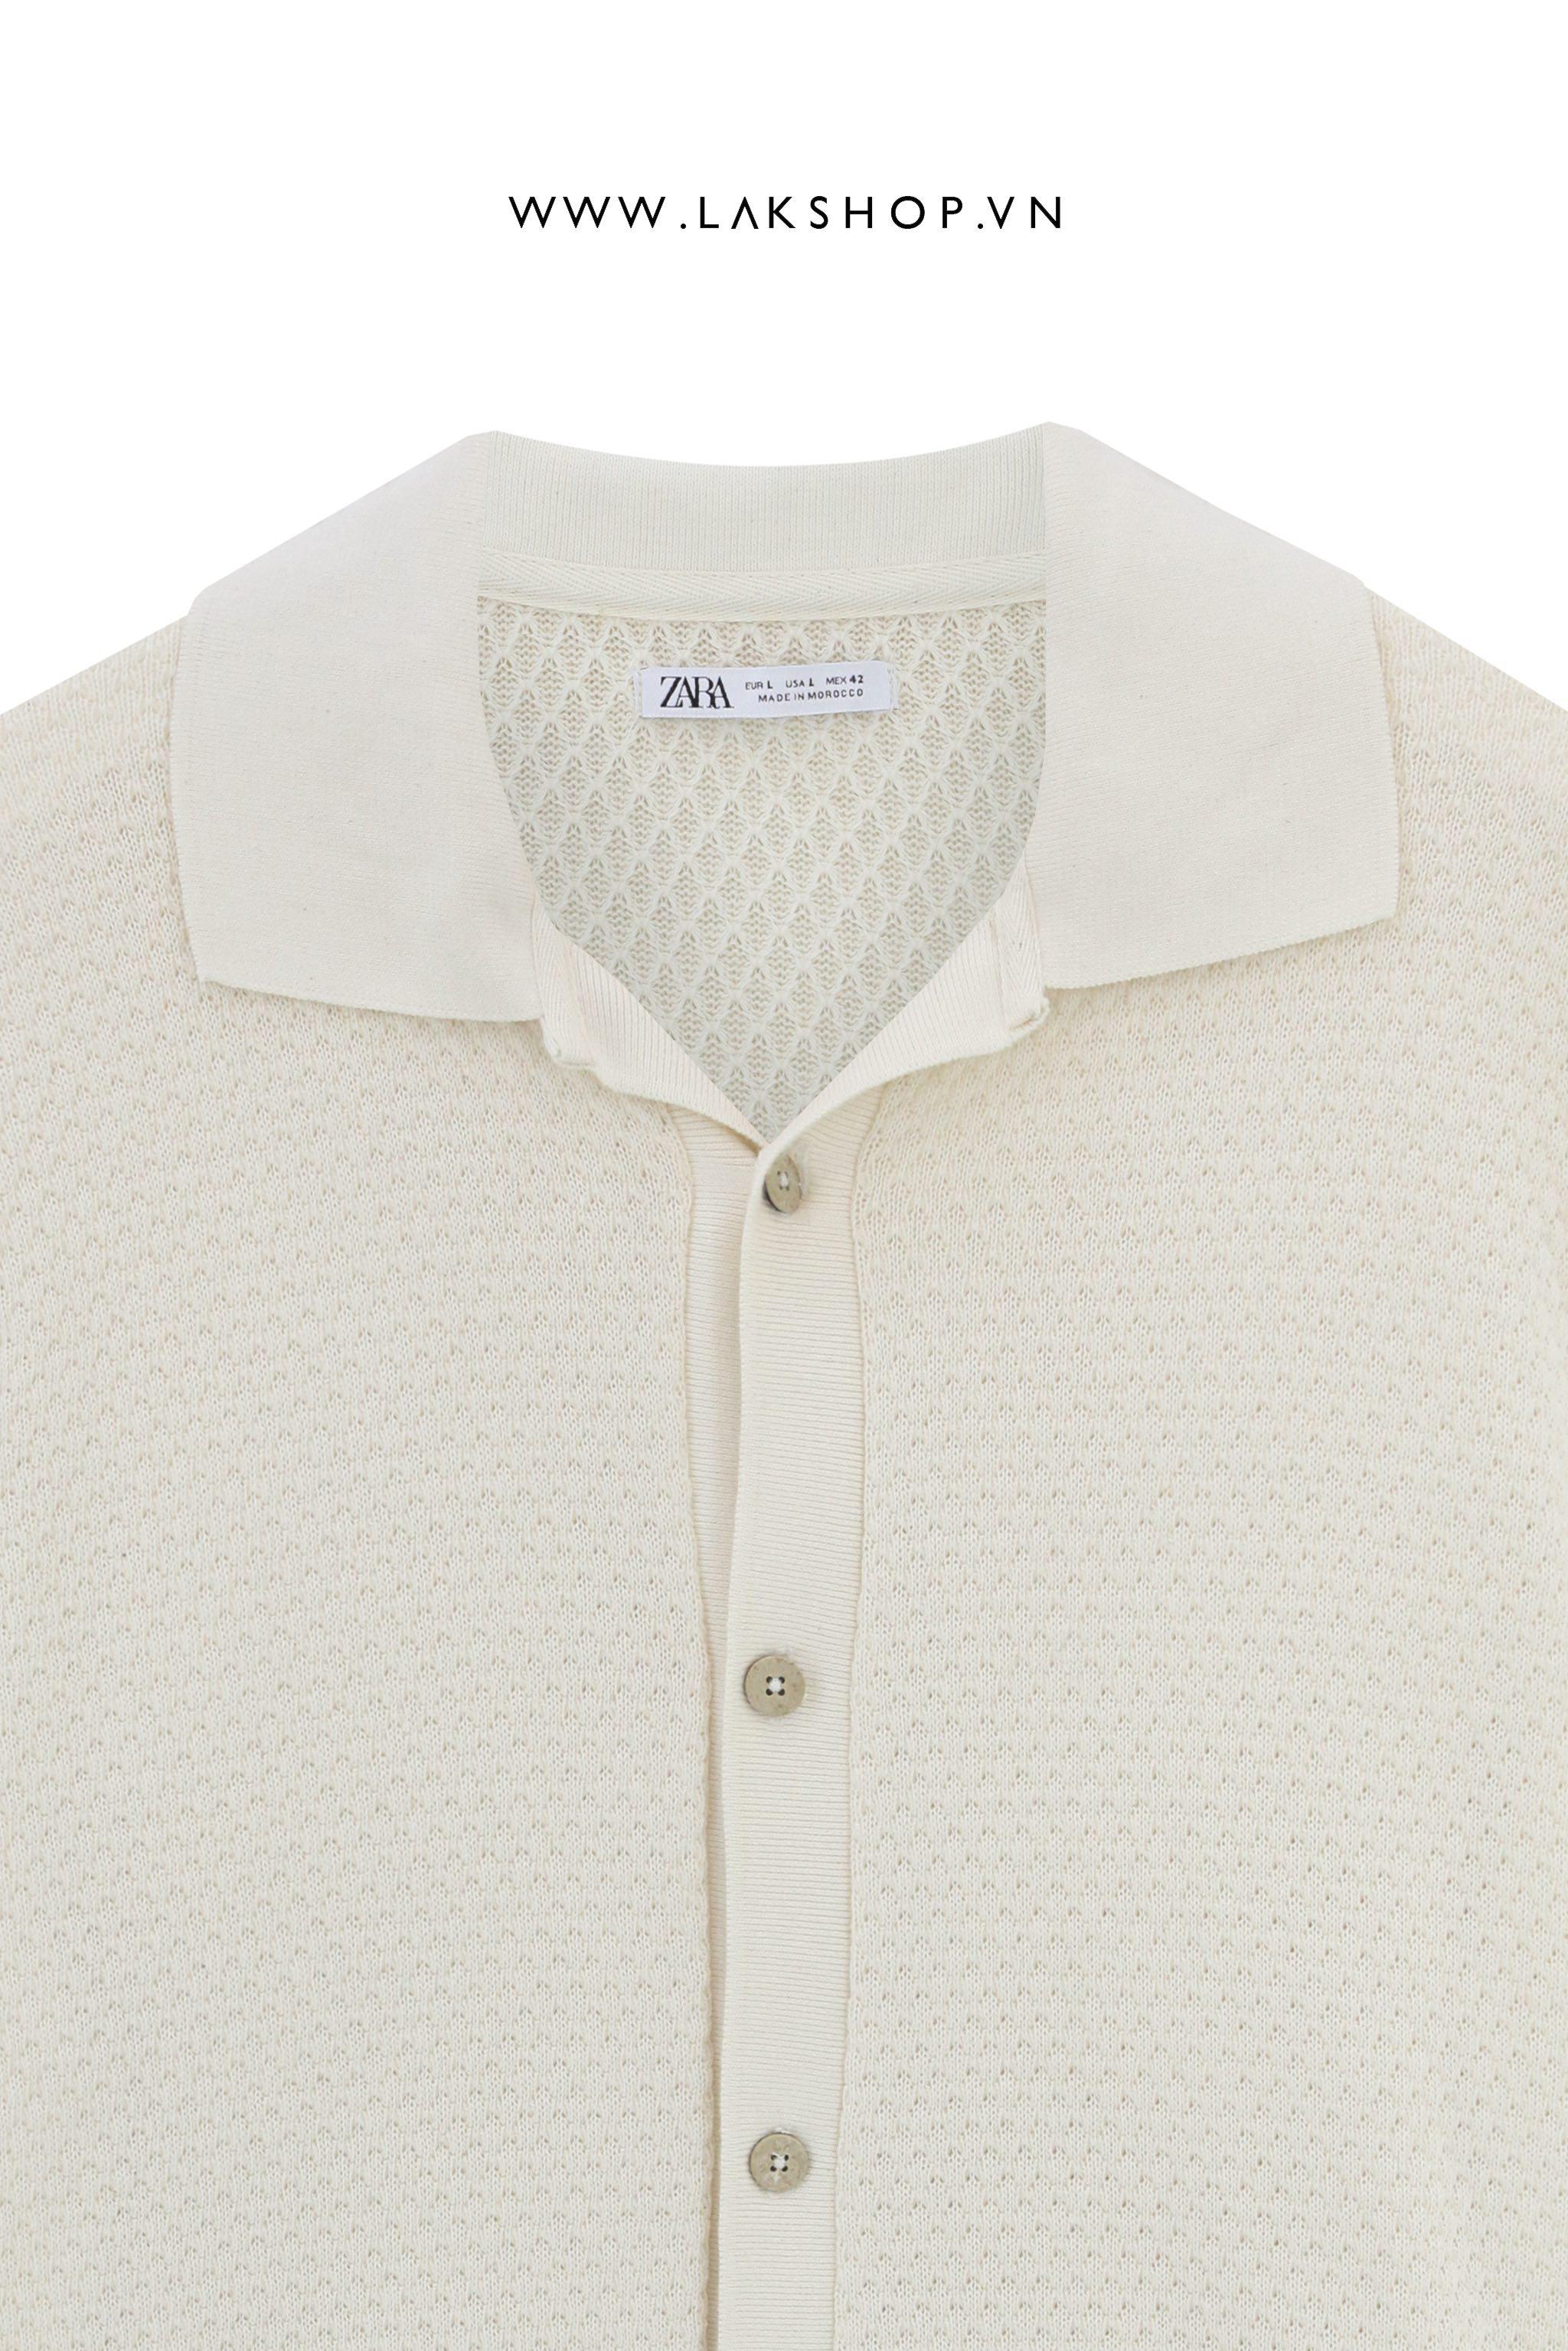 Louis Vuitton Hawaiian Tapestry Jacquard Gey Polo Shirt cv1